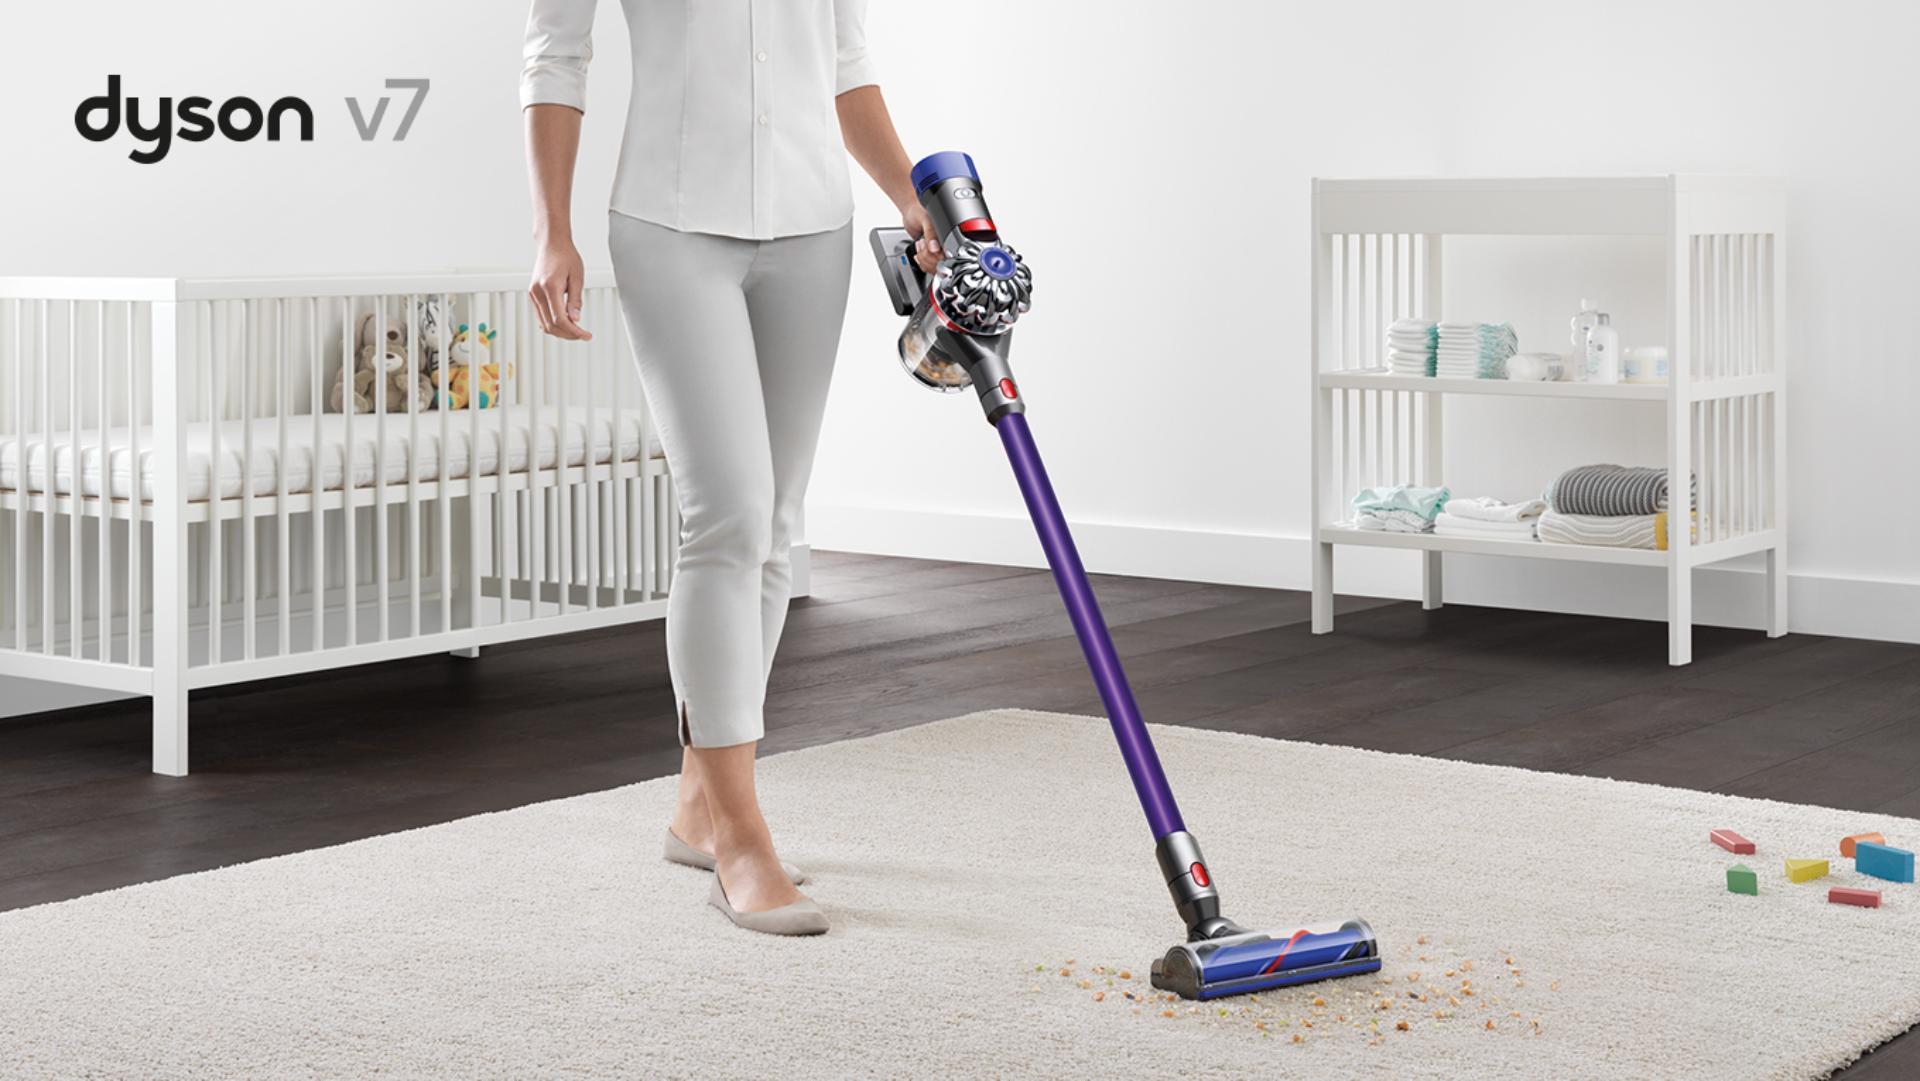 Dyson V7 Portable Cordless vacuum cleaner